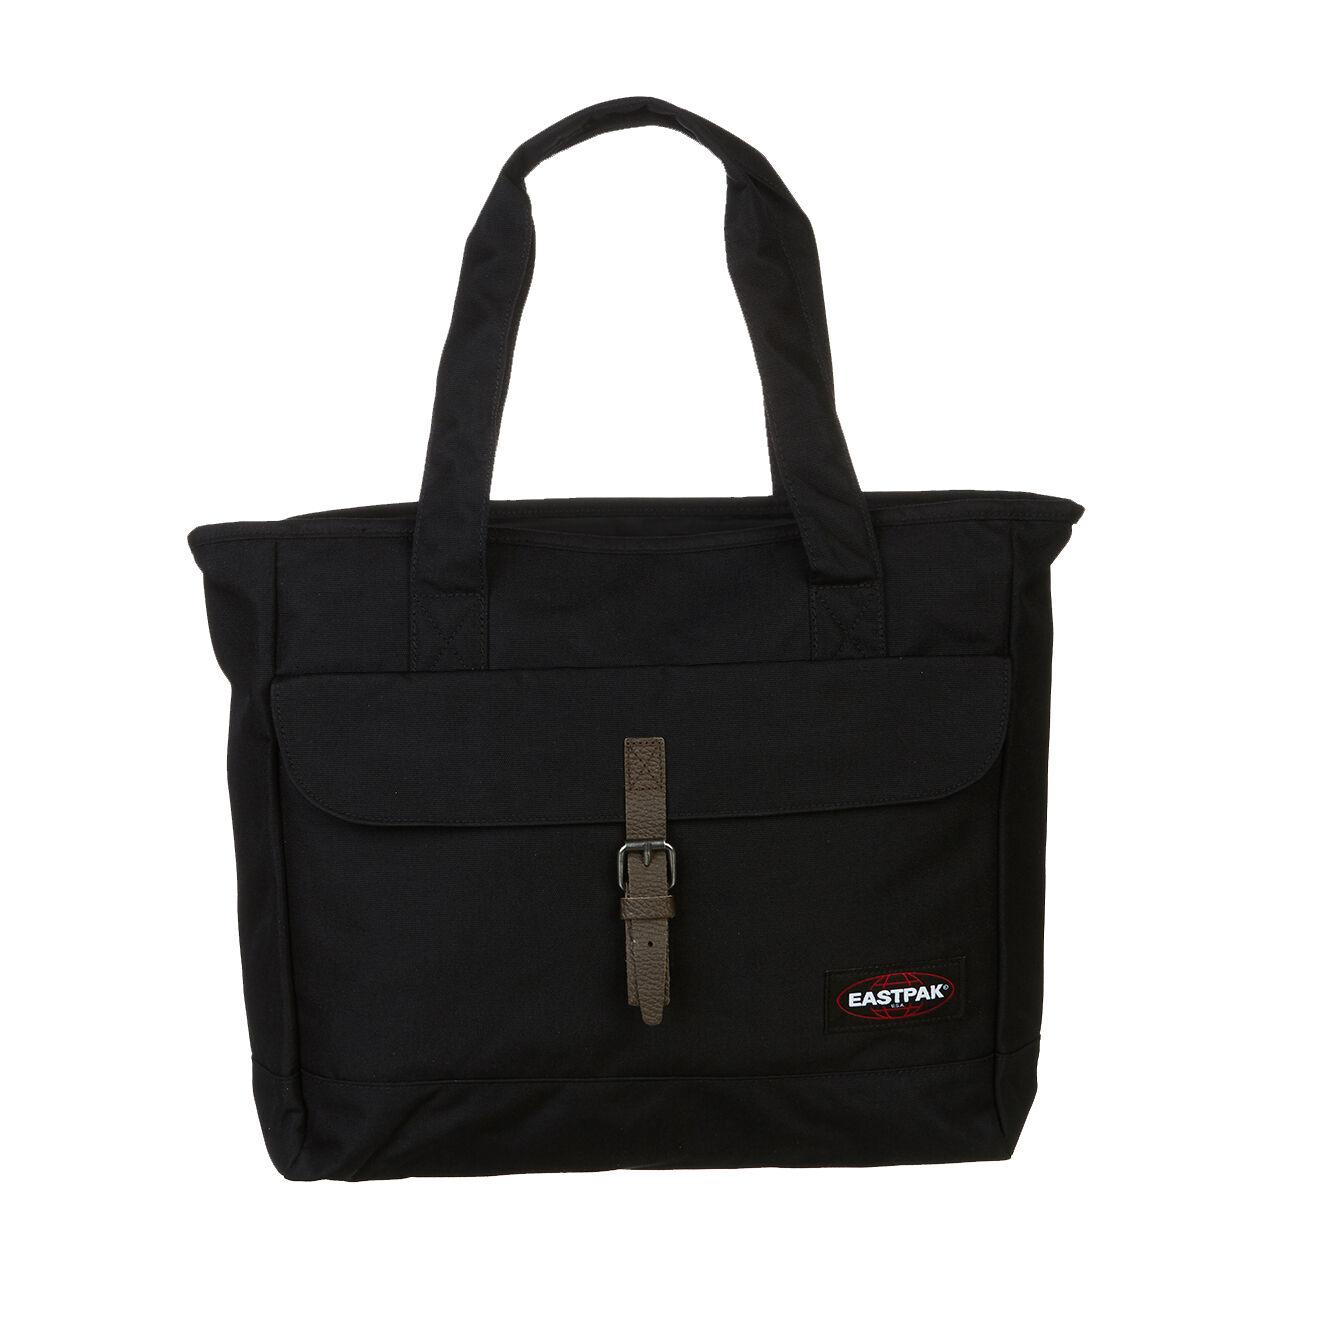 Eastpak Sac Cabas Flail noir - 33x36x12 cm